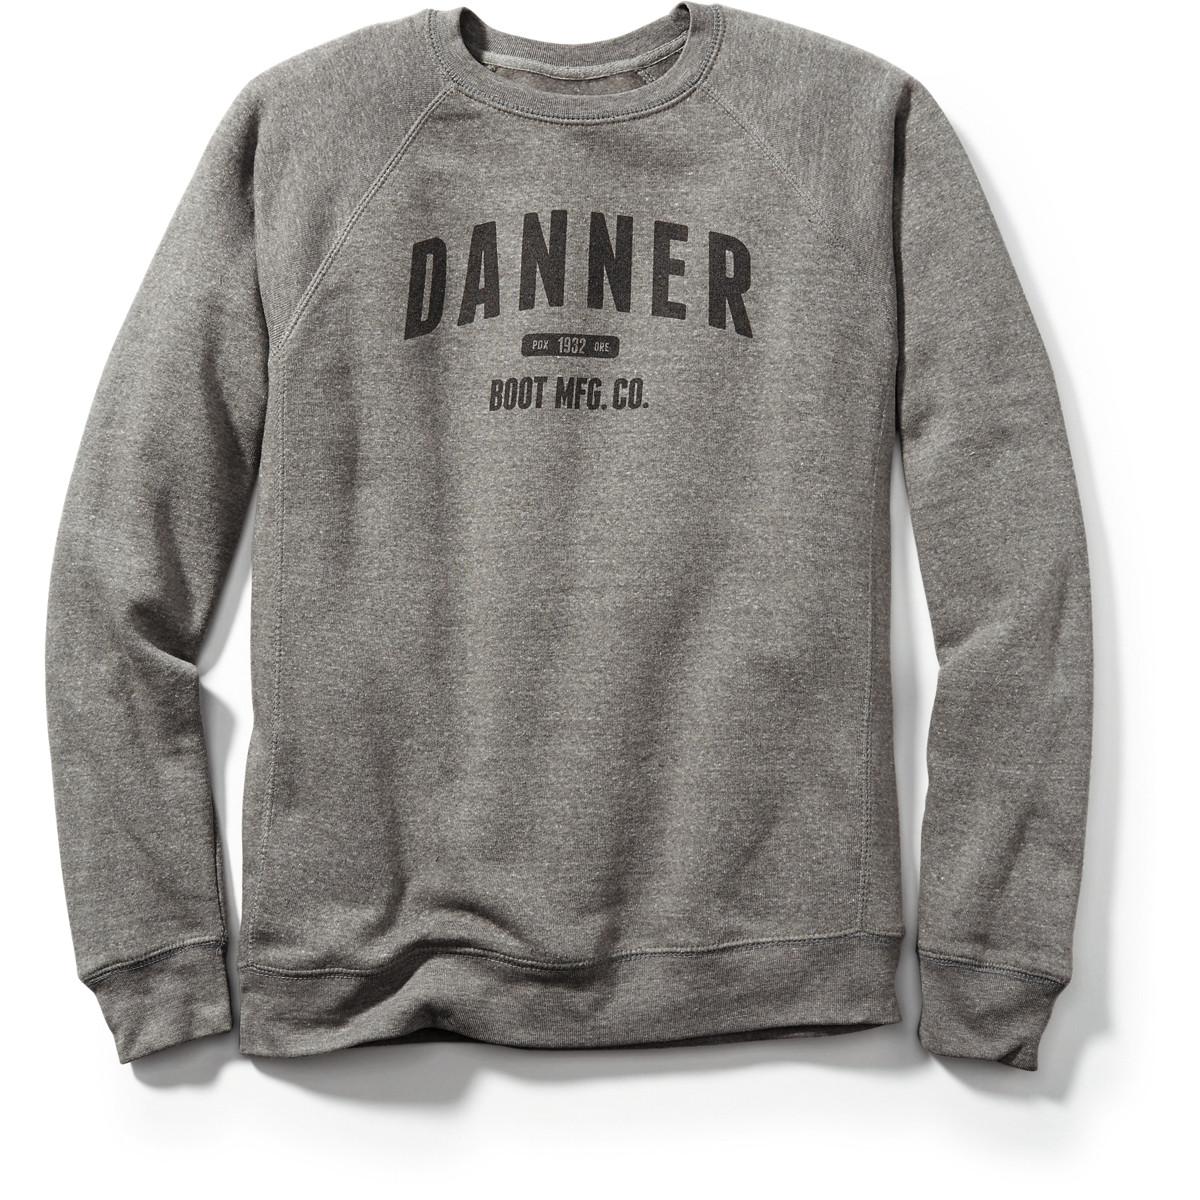 Danner Athletic Sweatshirt - Heather Gray